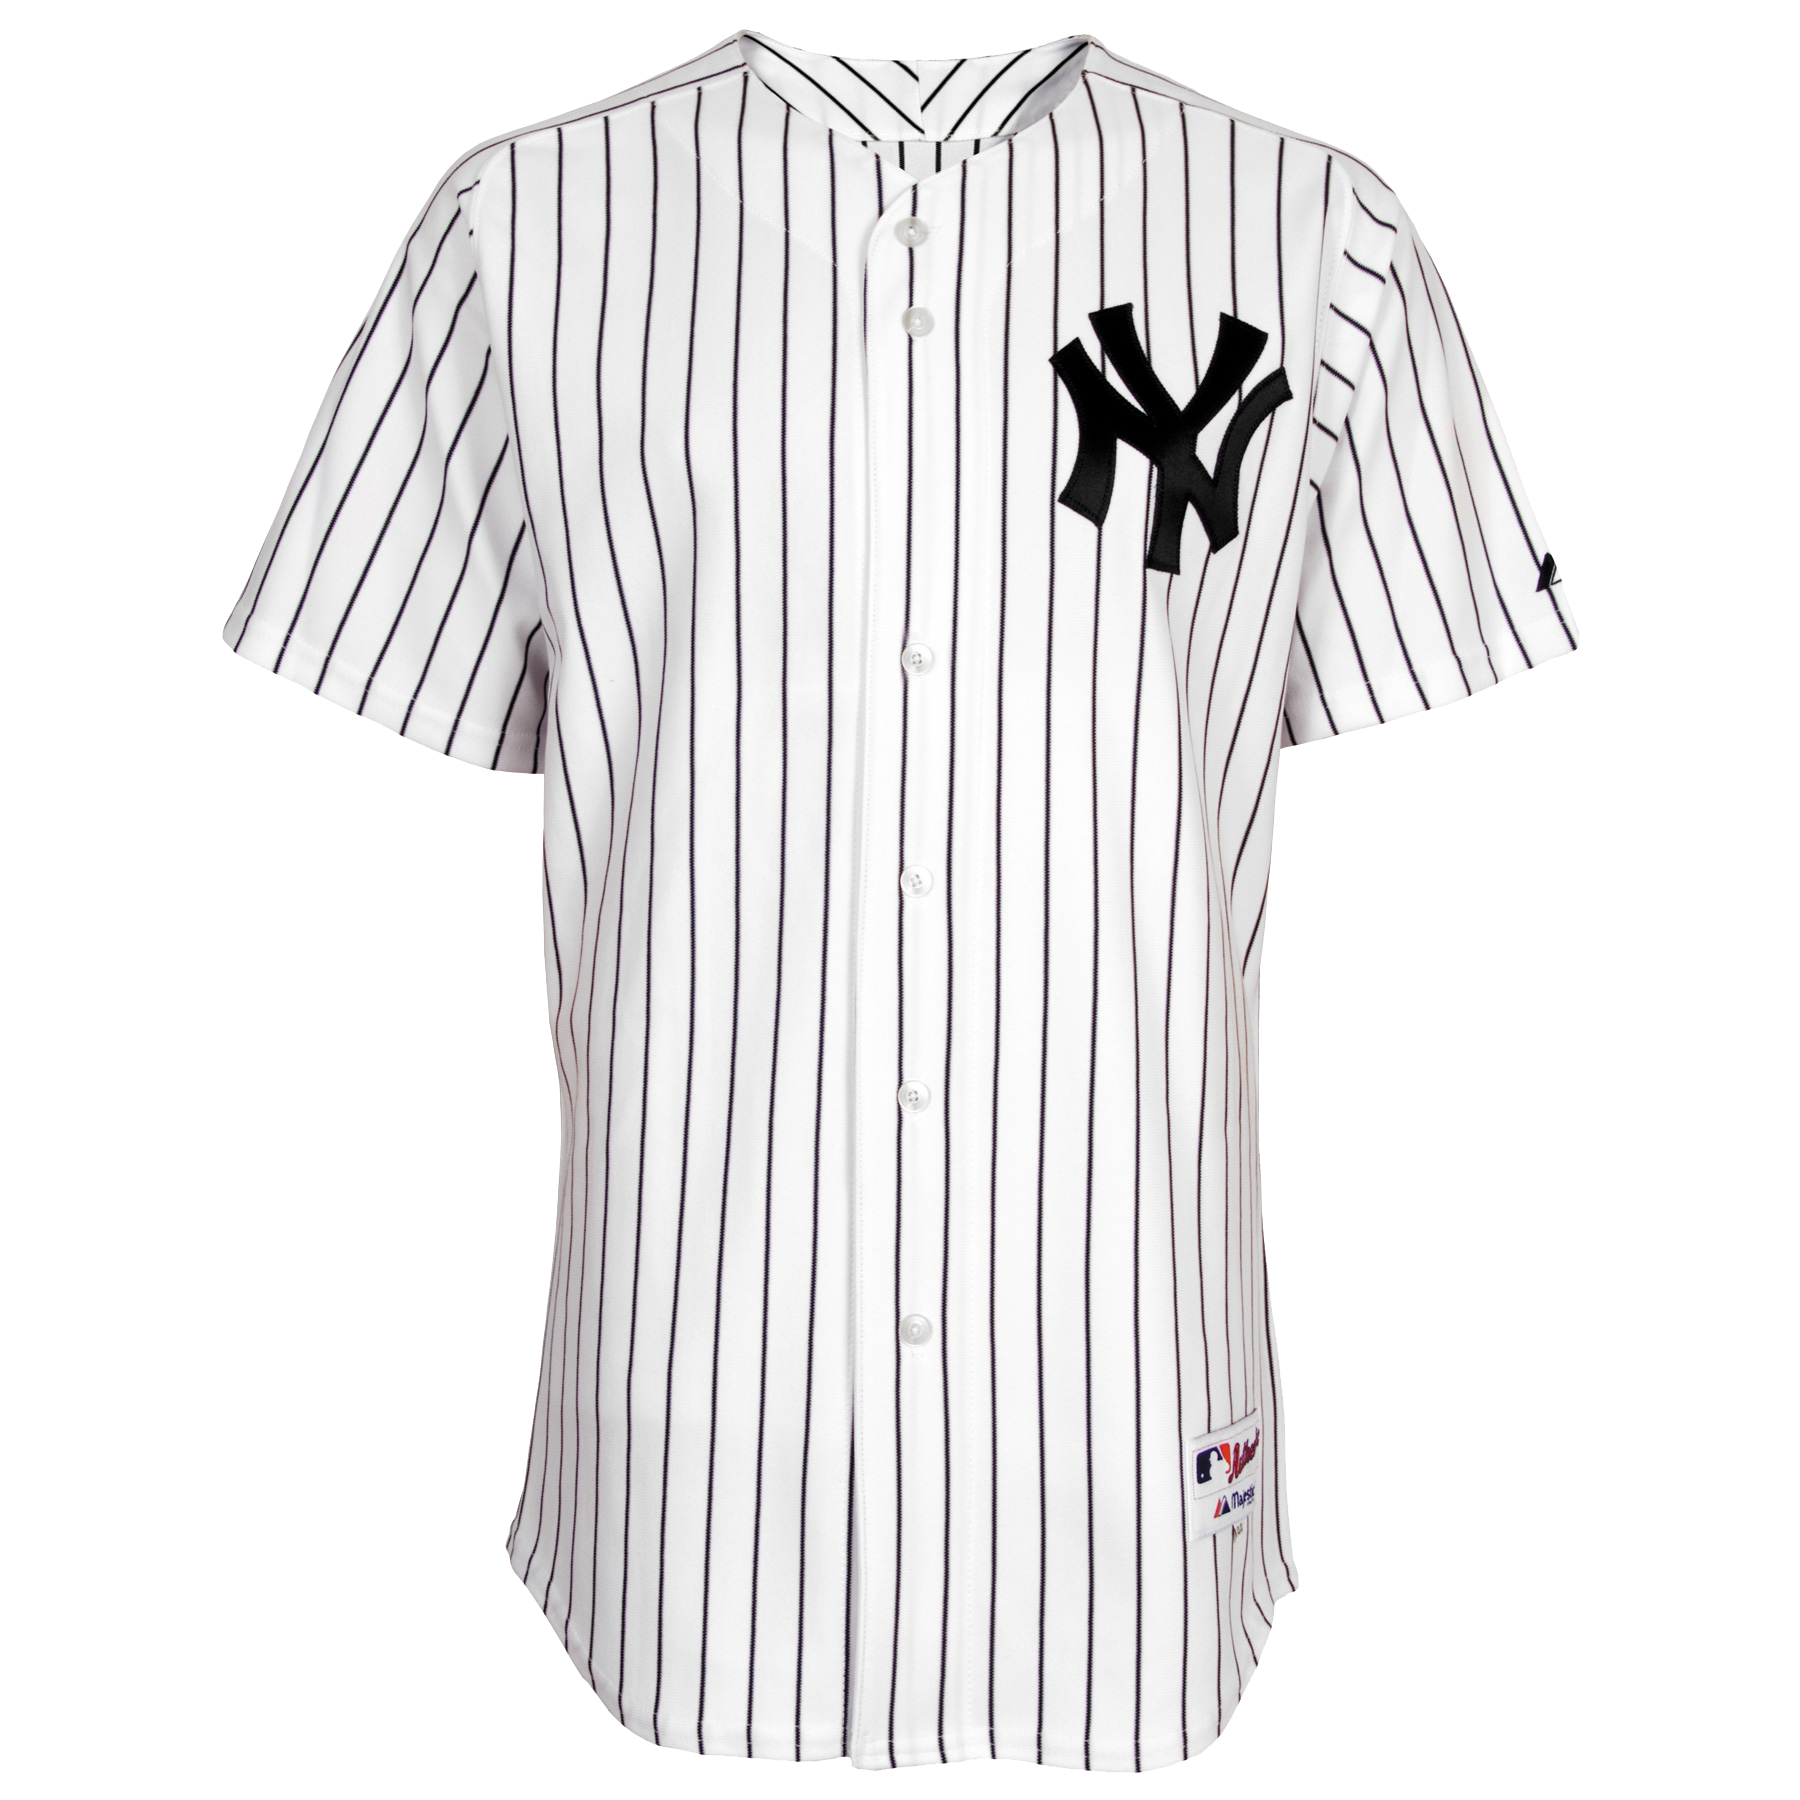 Derek Jeter New York Yankees Majestic Authentic Jersey - White - Walmart.com 5e75d6465d0